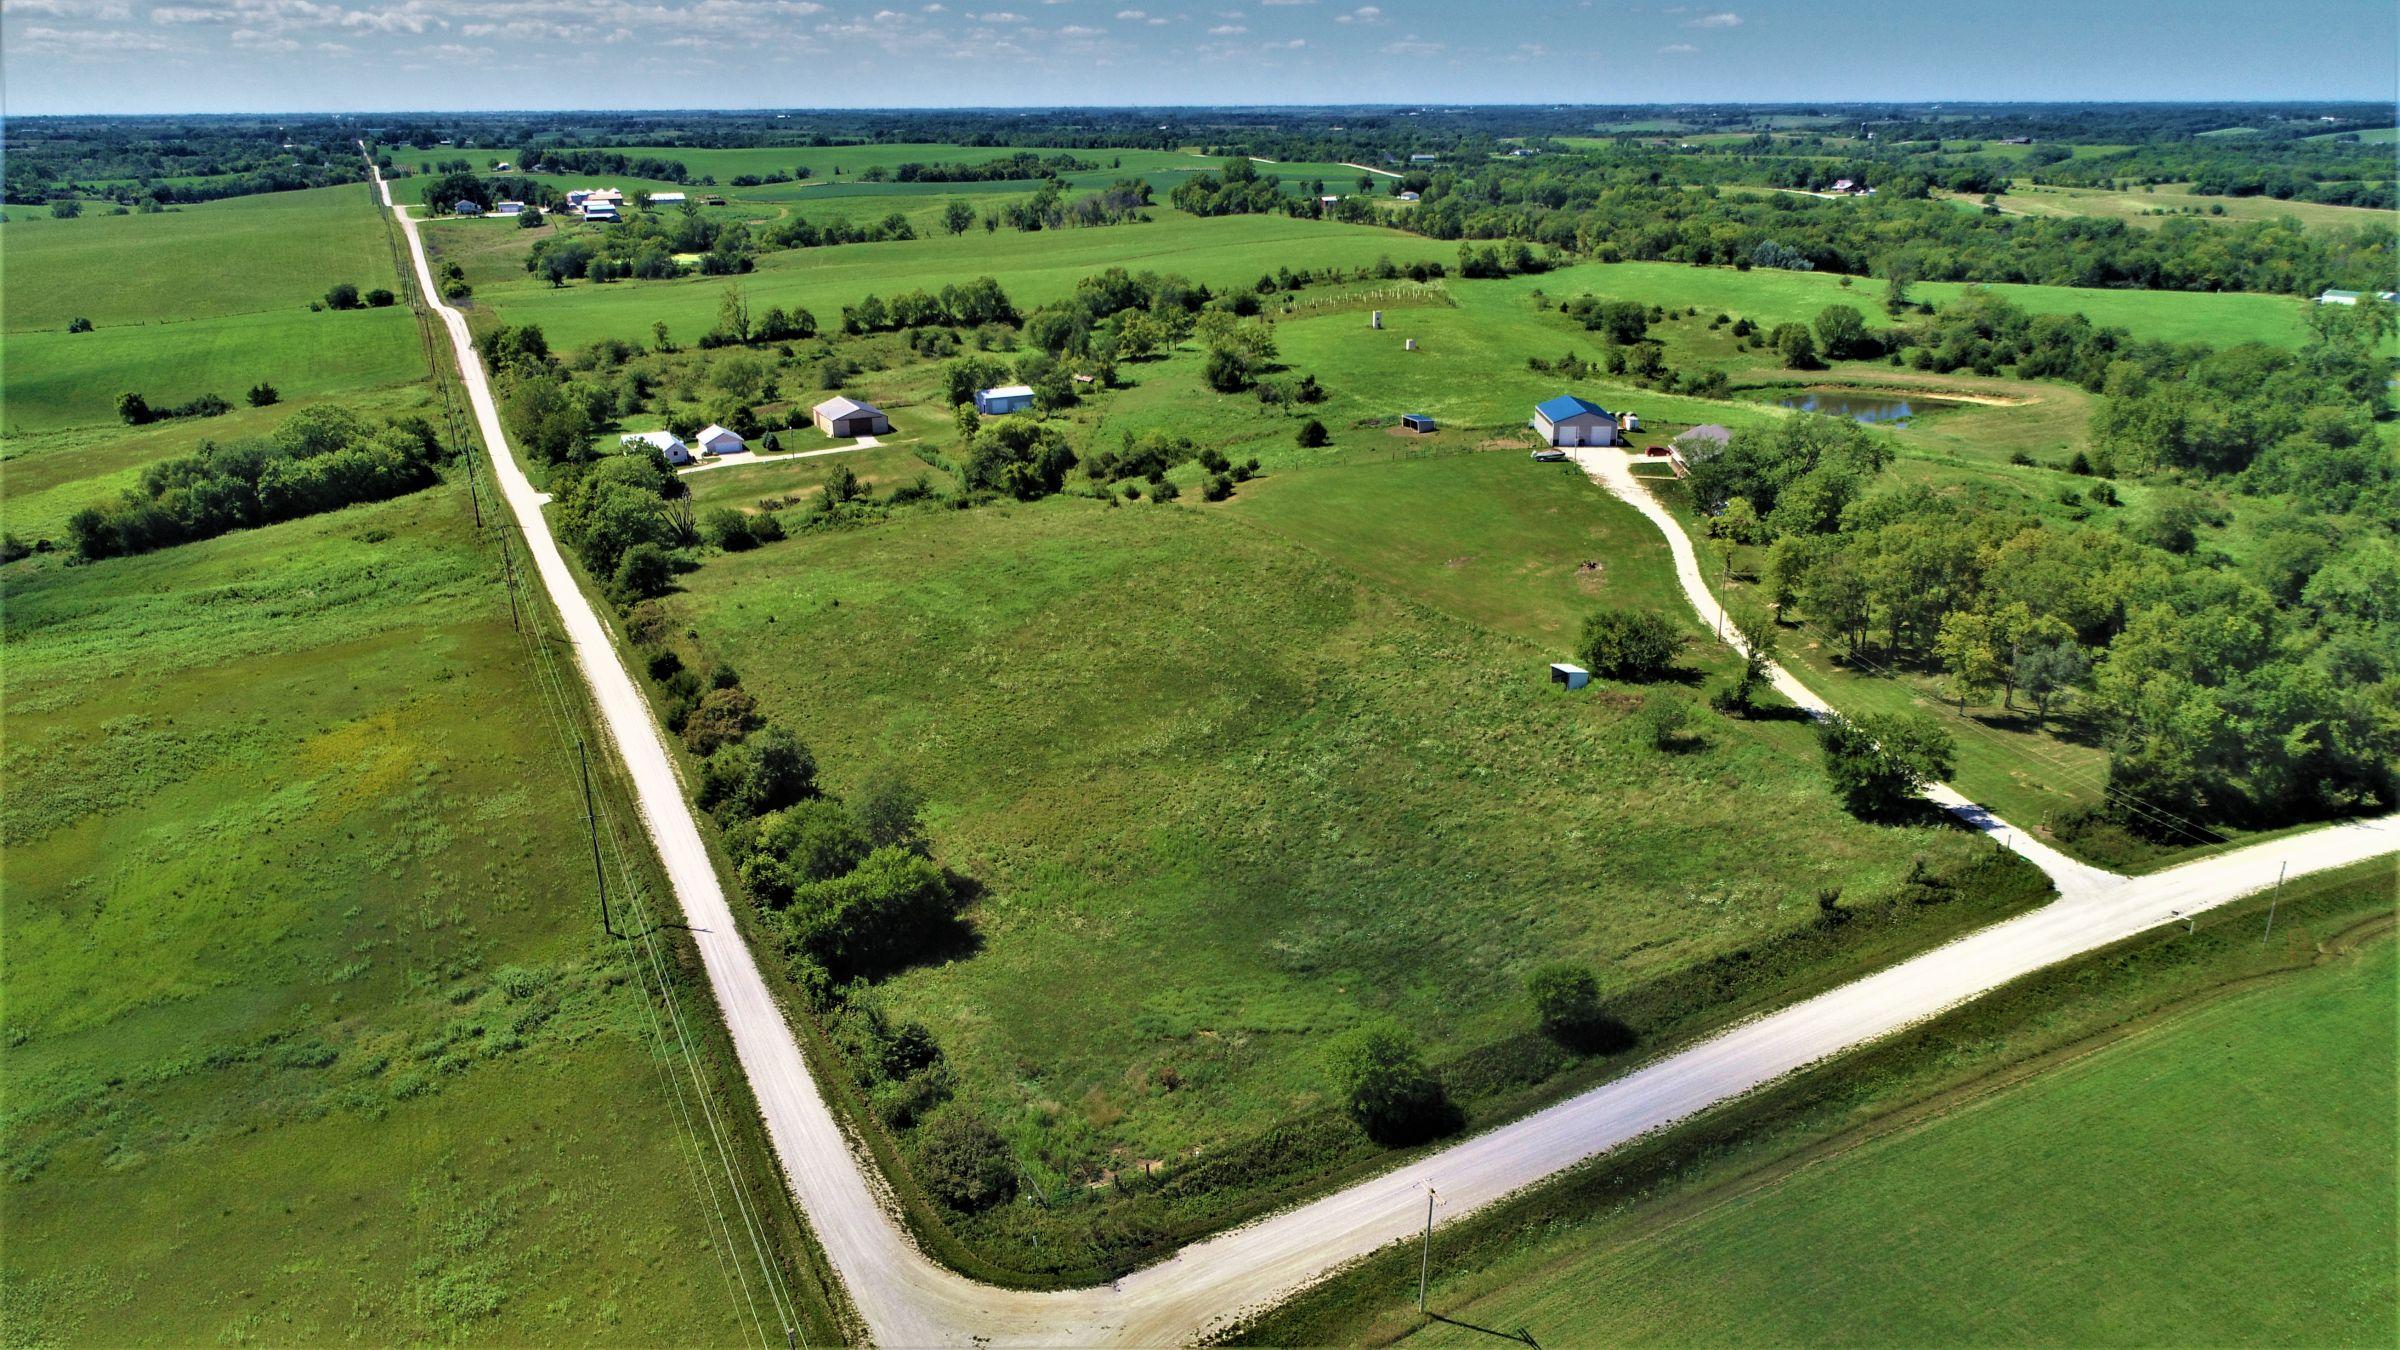 land-warren-county-iowa-6-acres-listing-number-15709-0-2021-08-27-202001.JPG